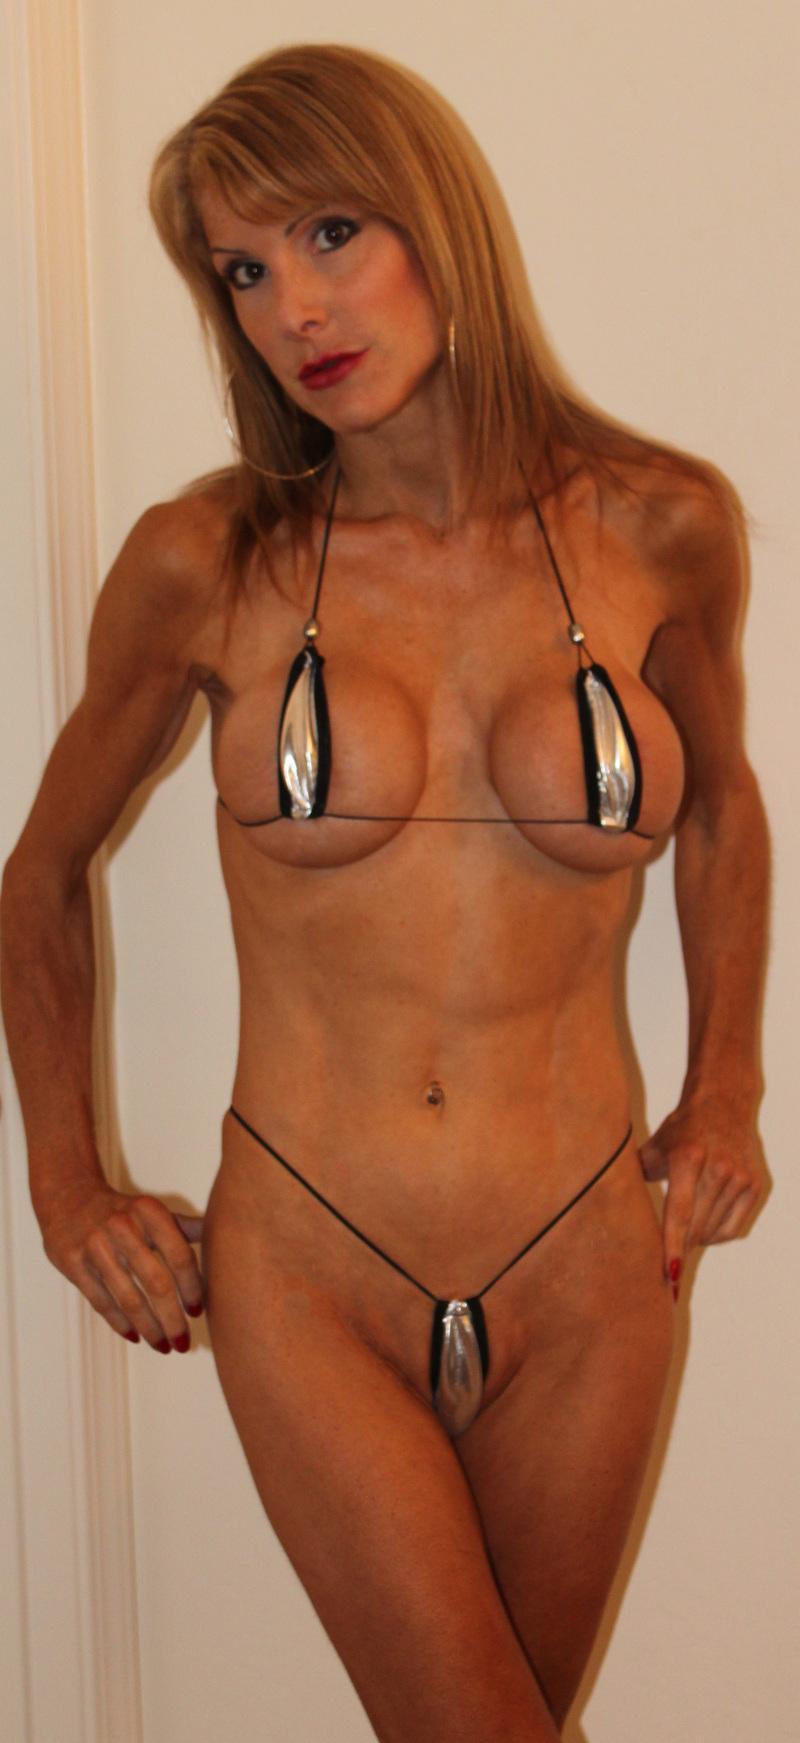 Jelena jensen panty corset masturbation